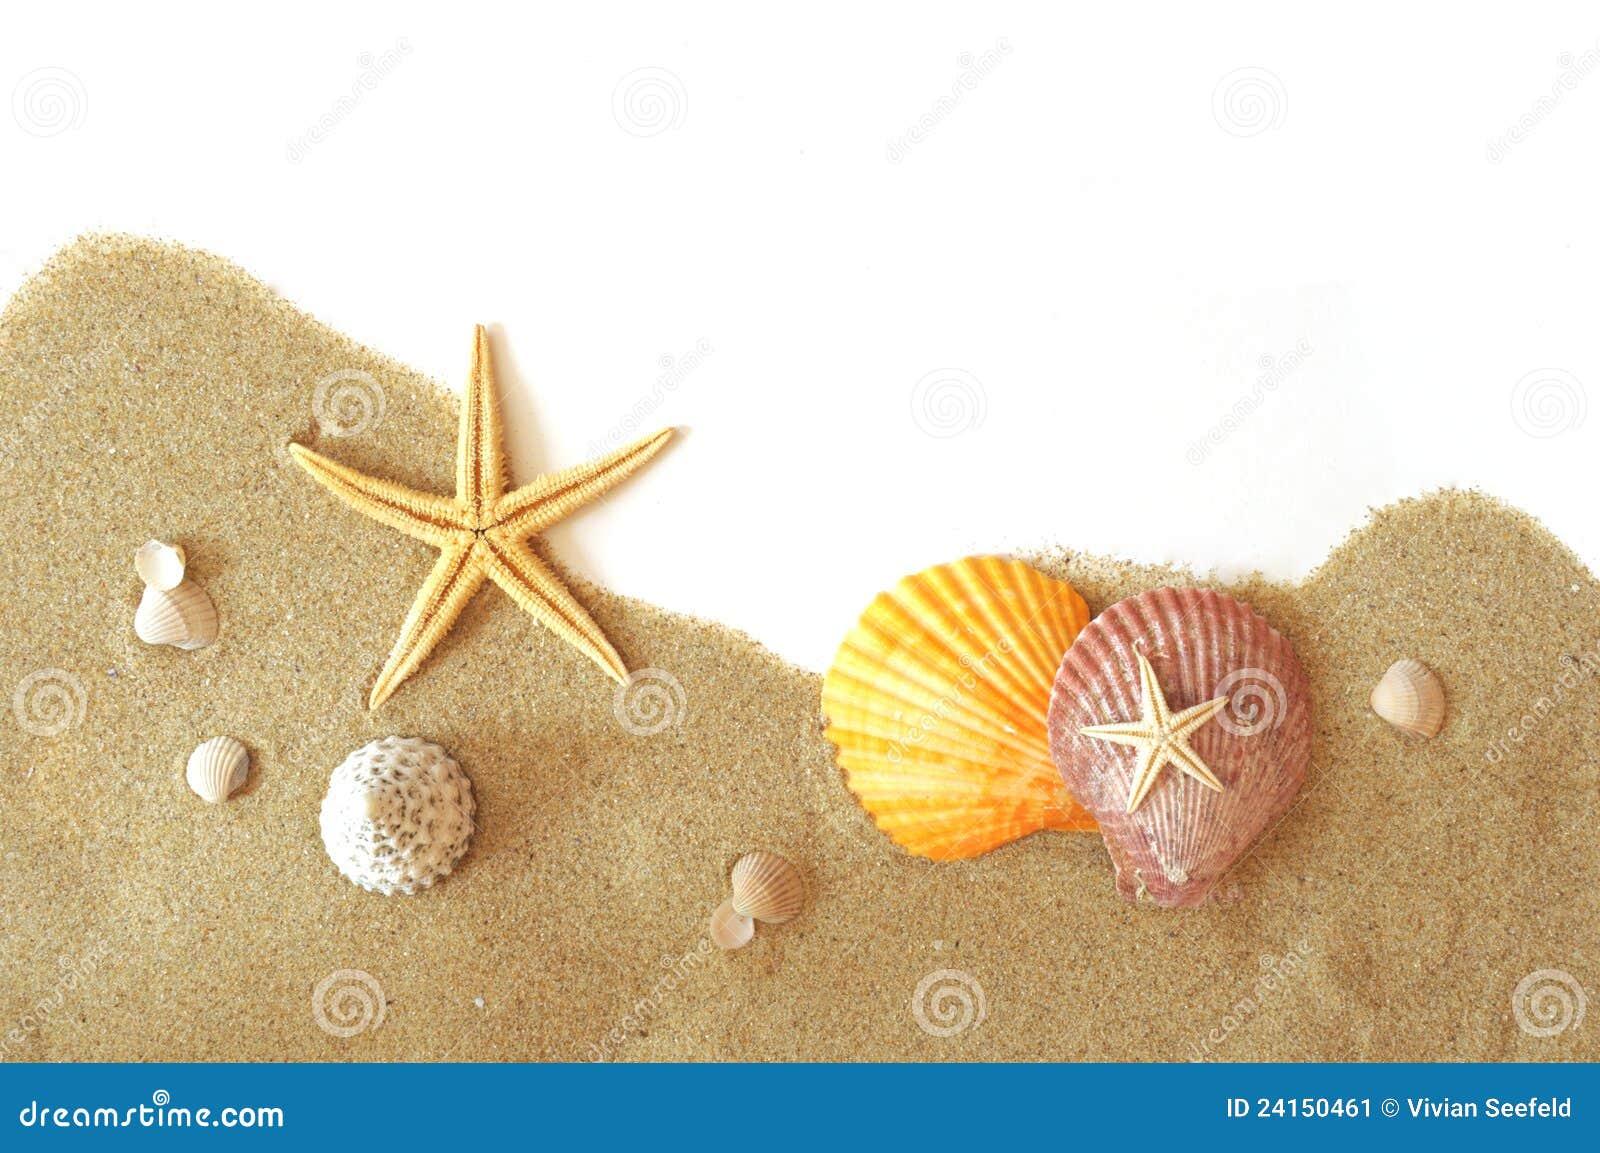 Sand And Seastar...Clip Art Starfish Free